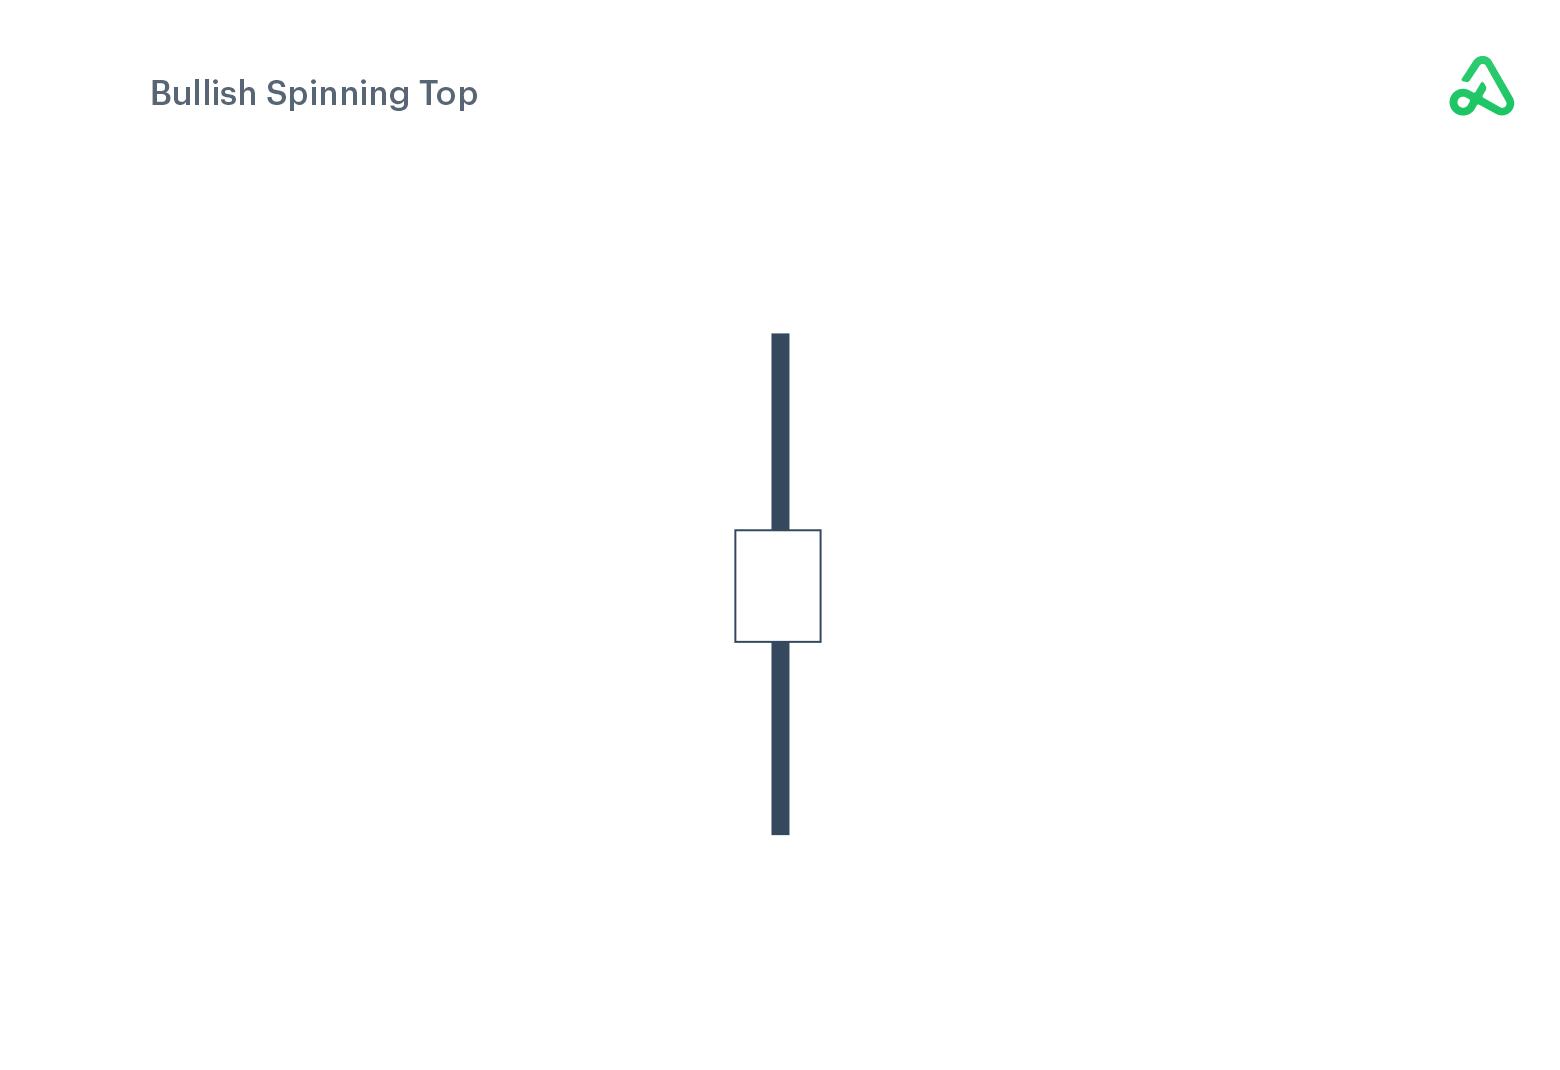 Bullish Spinning Top example image